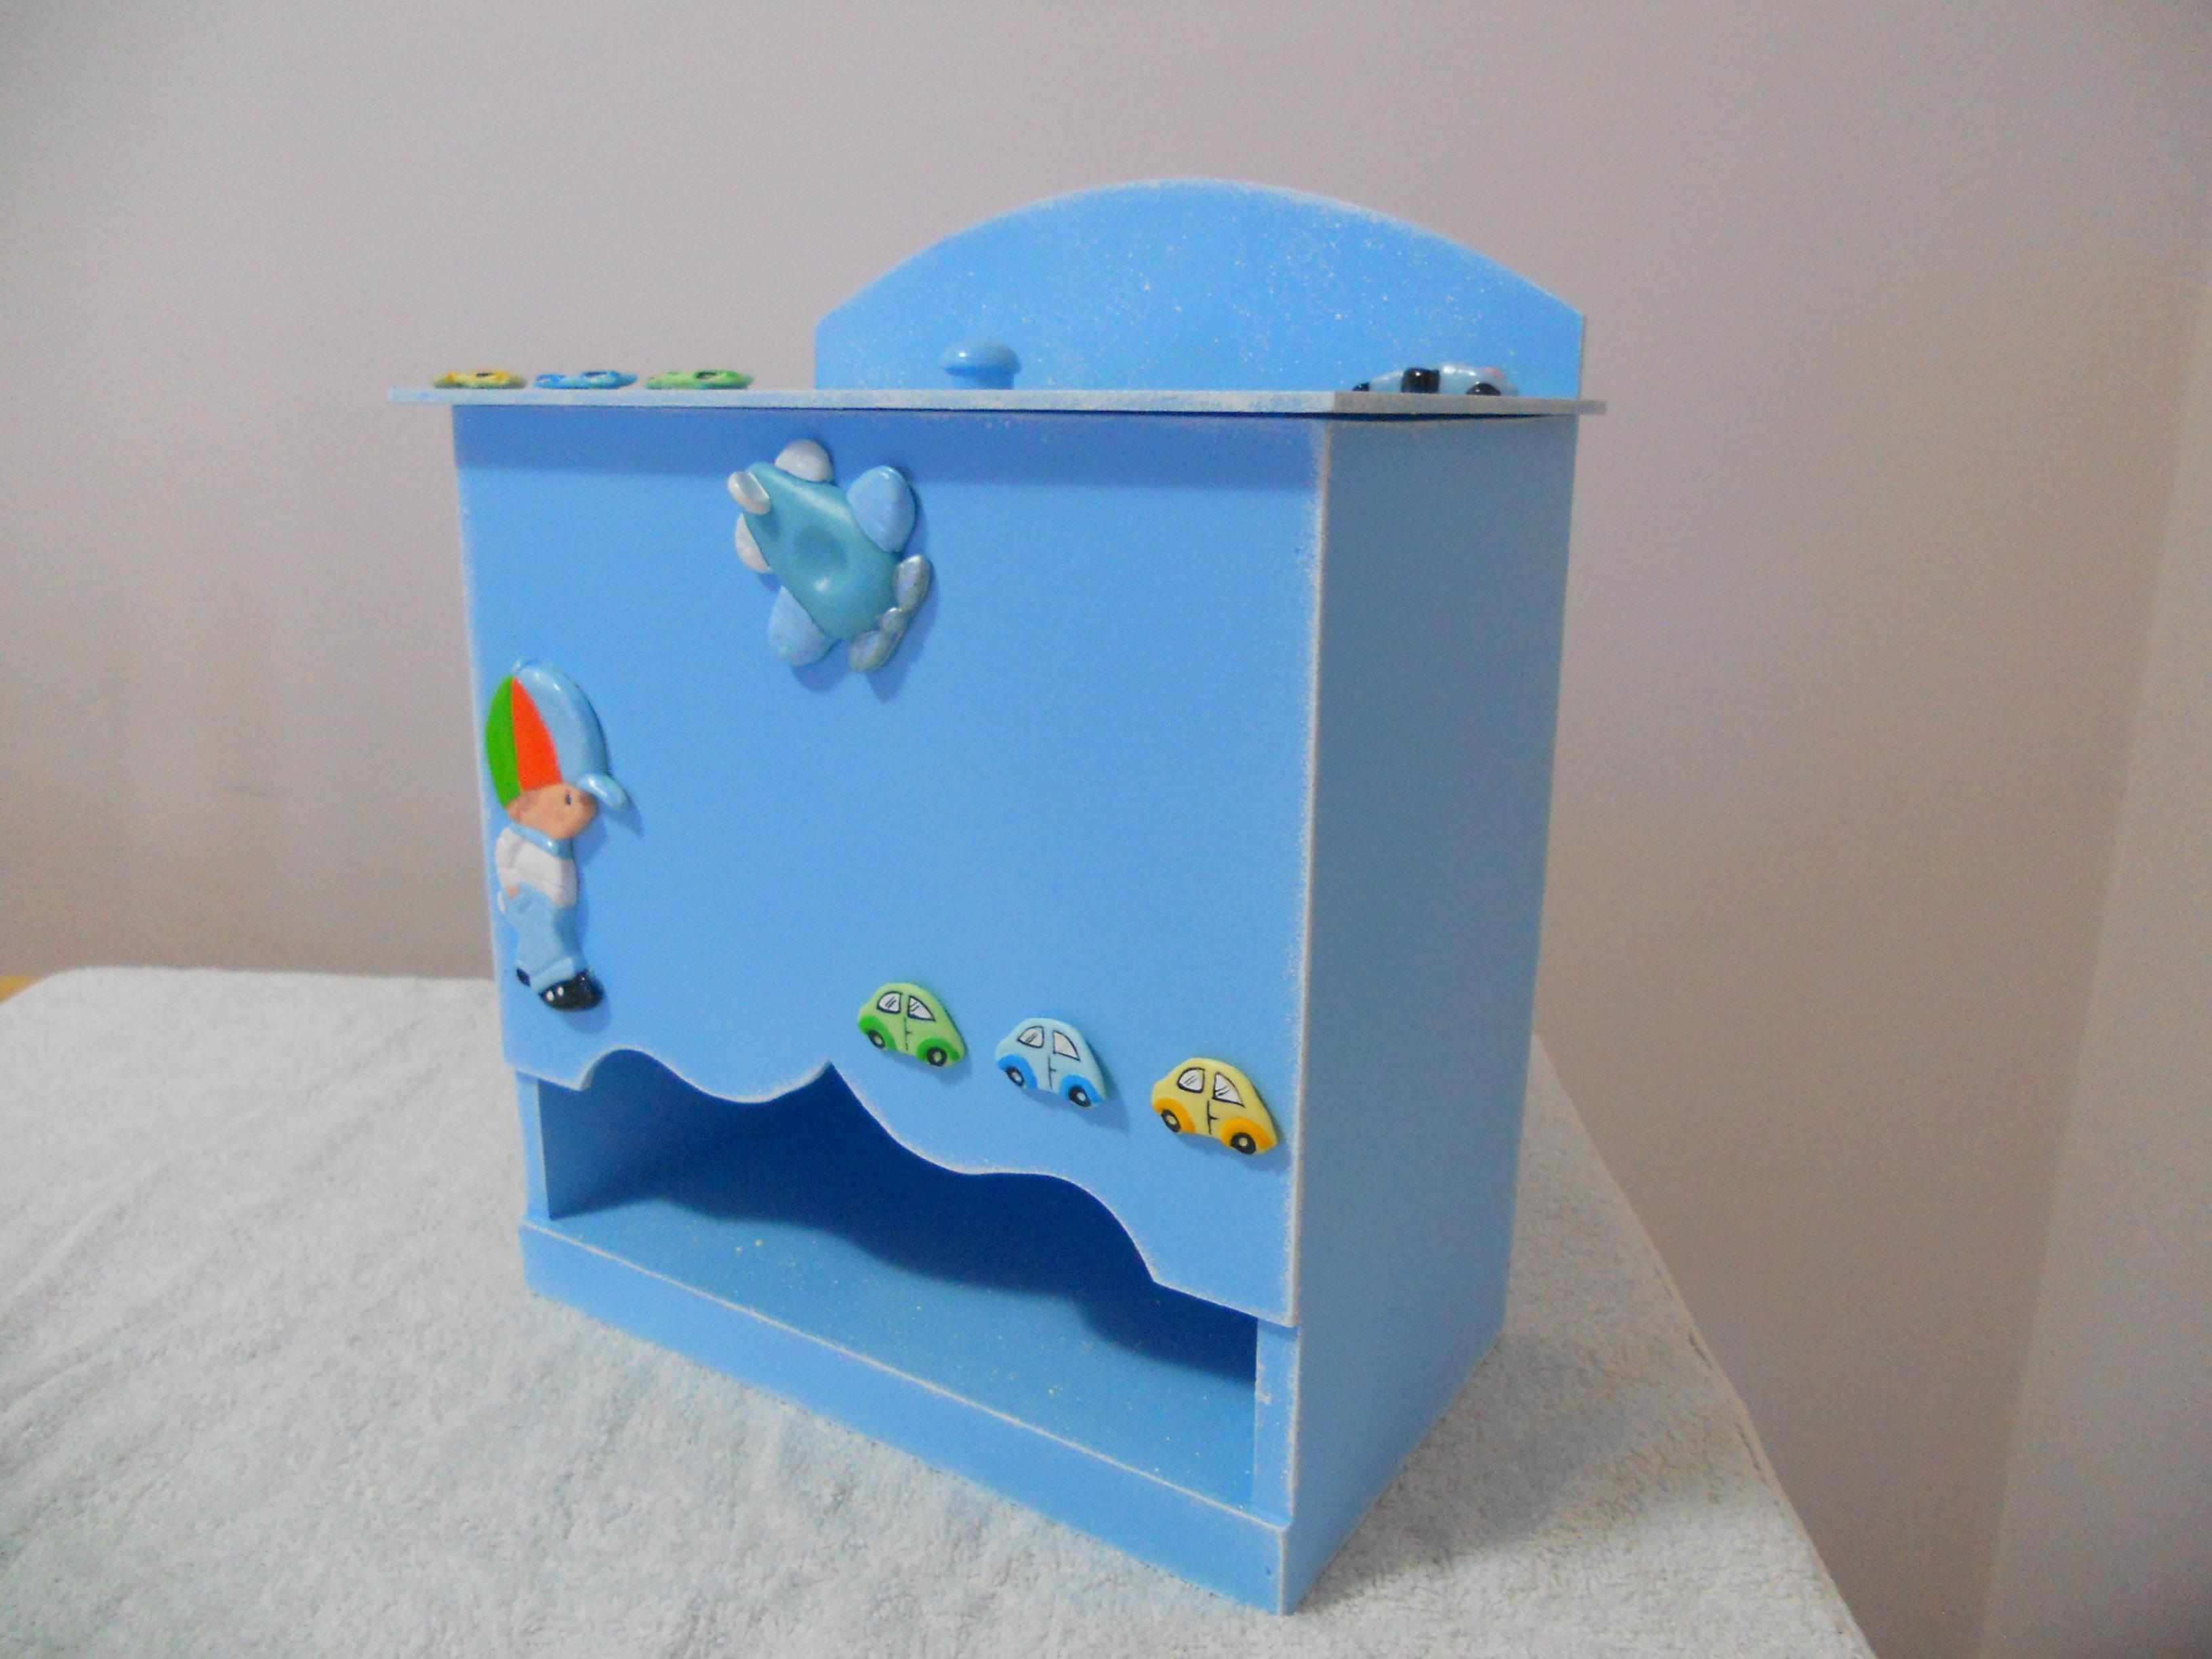 porta fralda artesanato em mdf porta fralda artesanato em mdf #093871 3264x2448